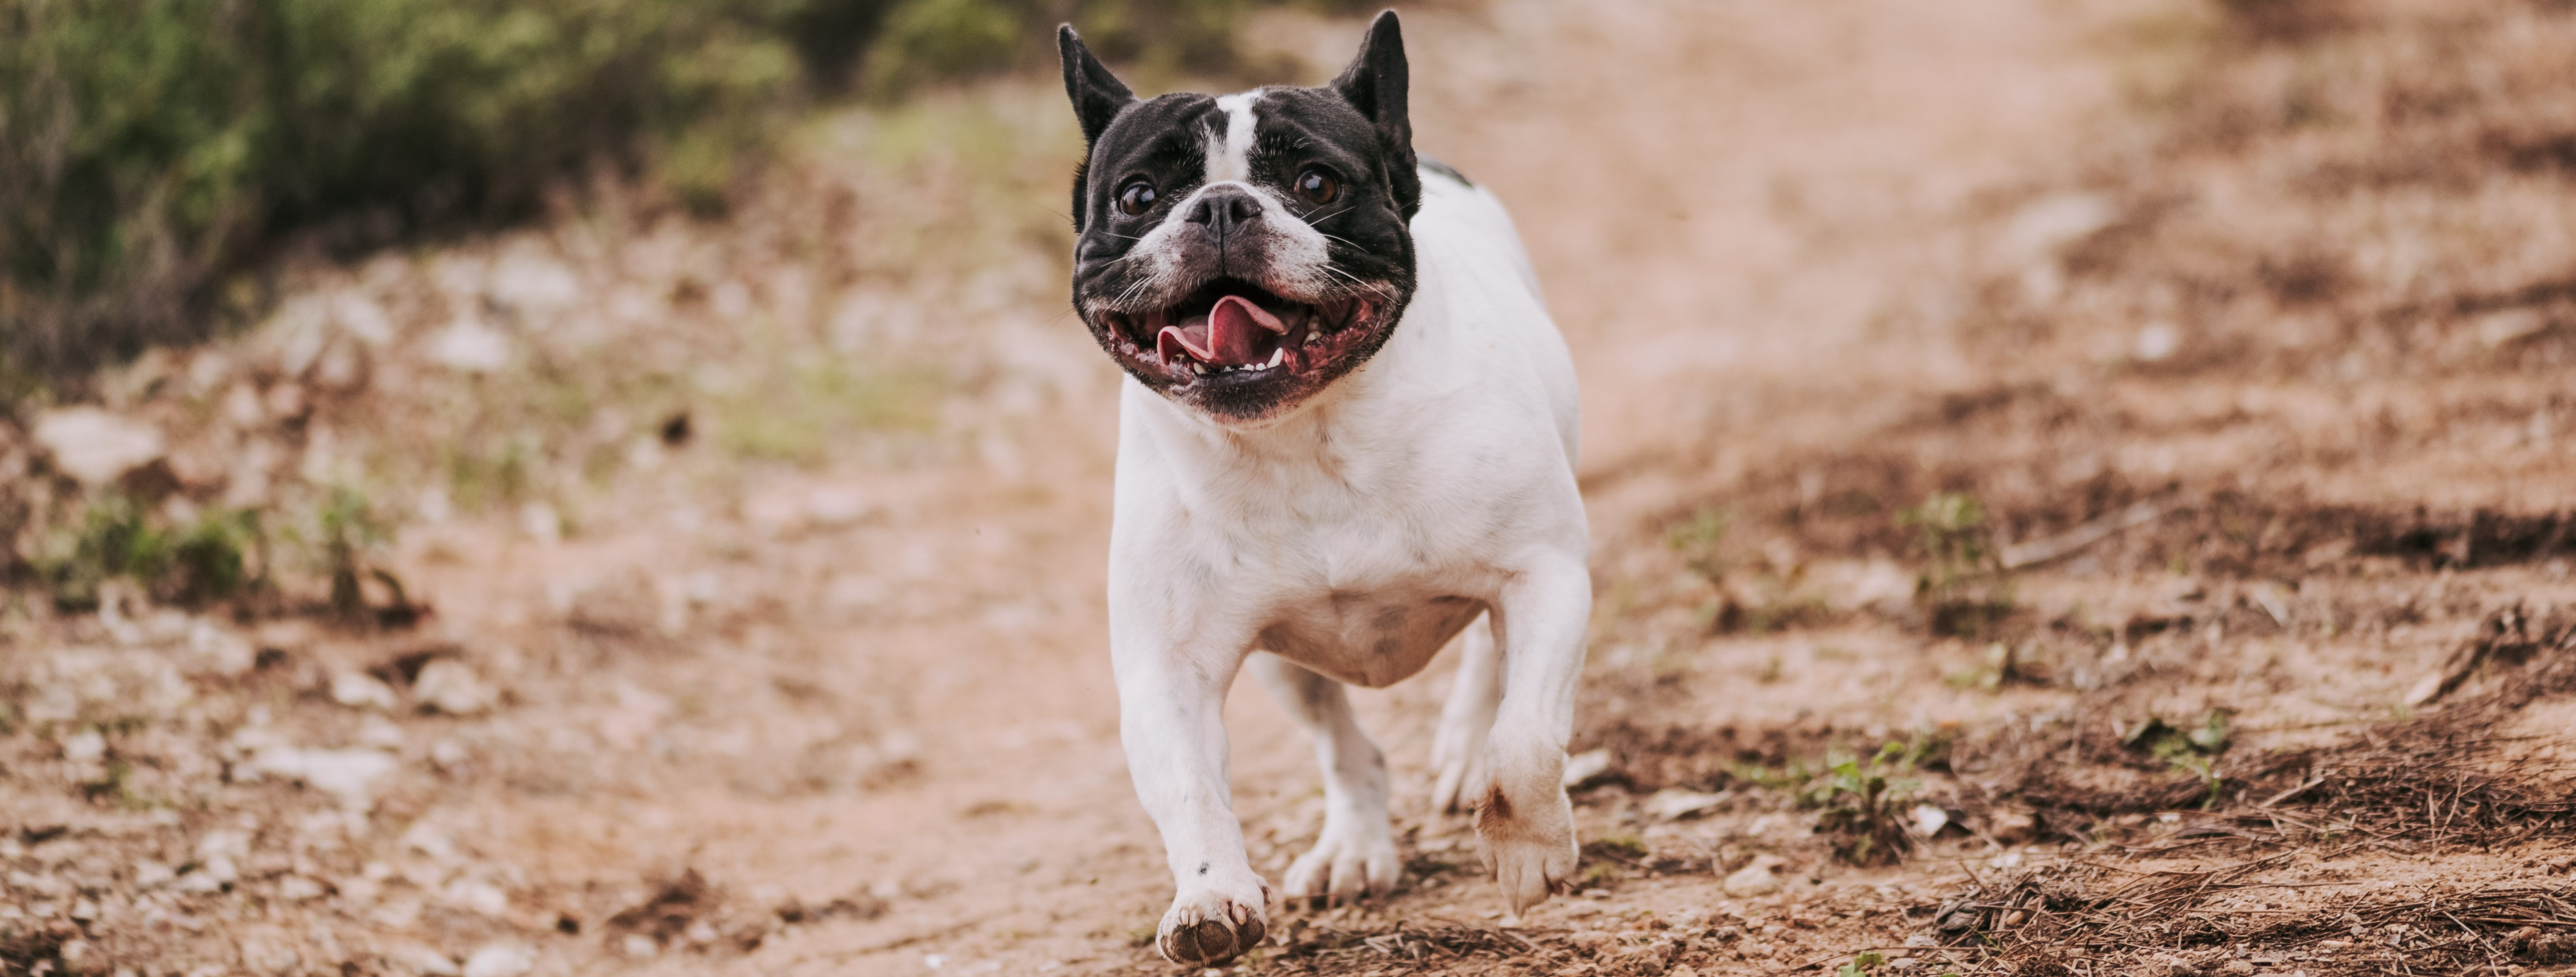 Photo of bulldog running on trail